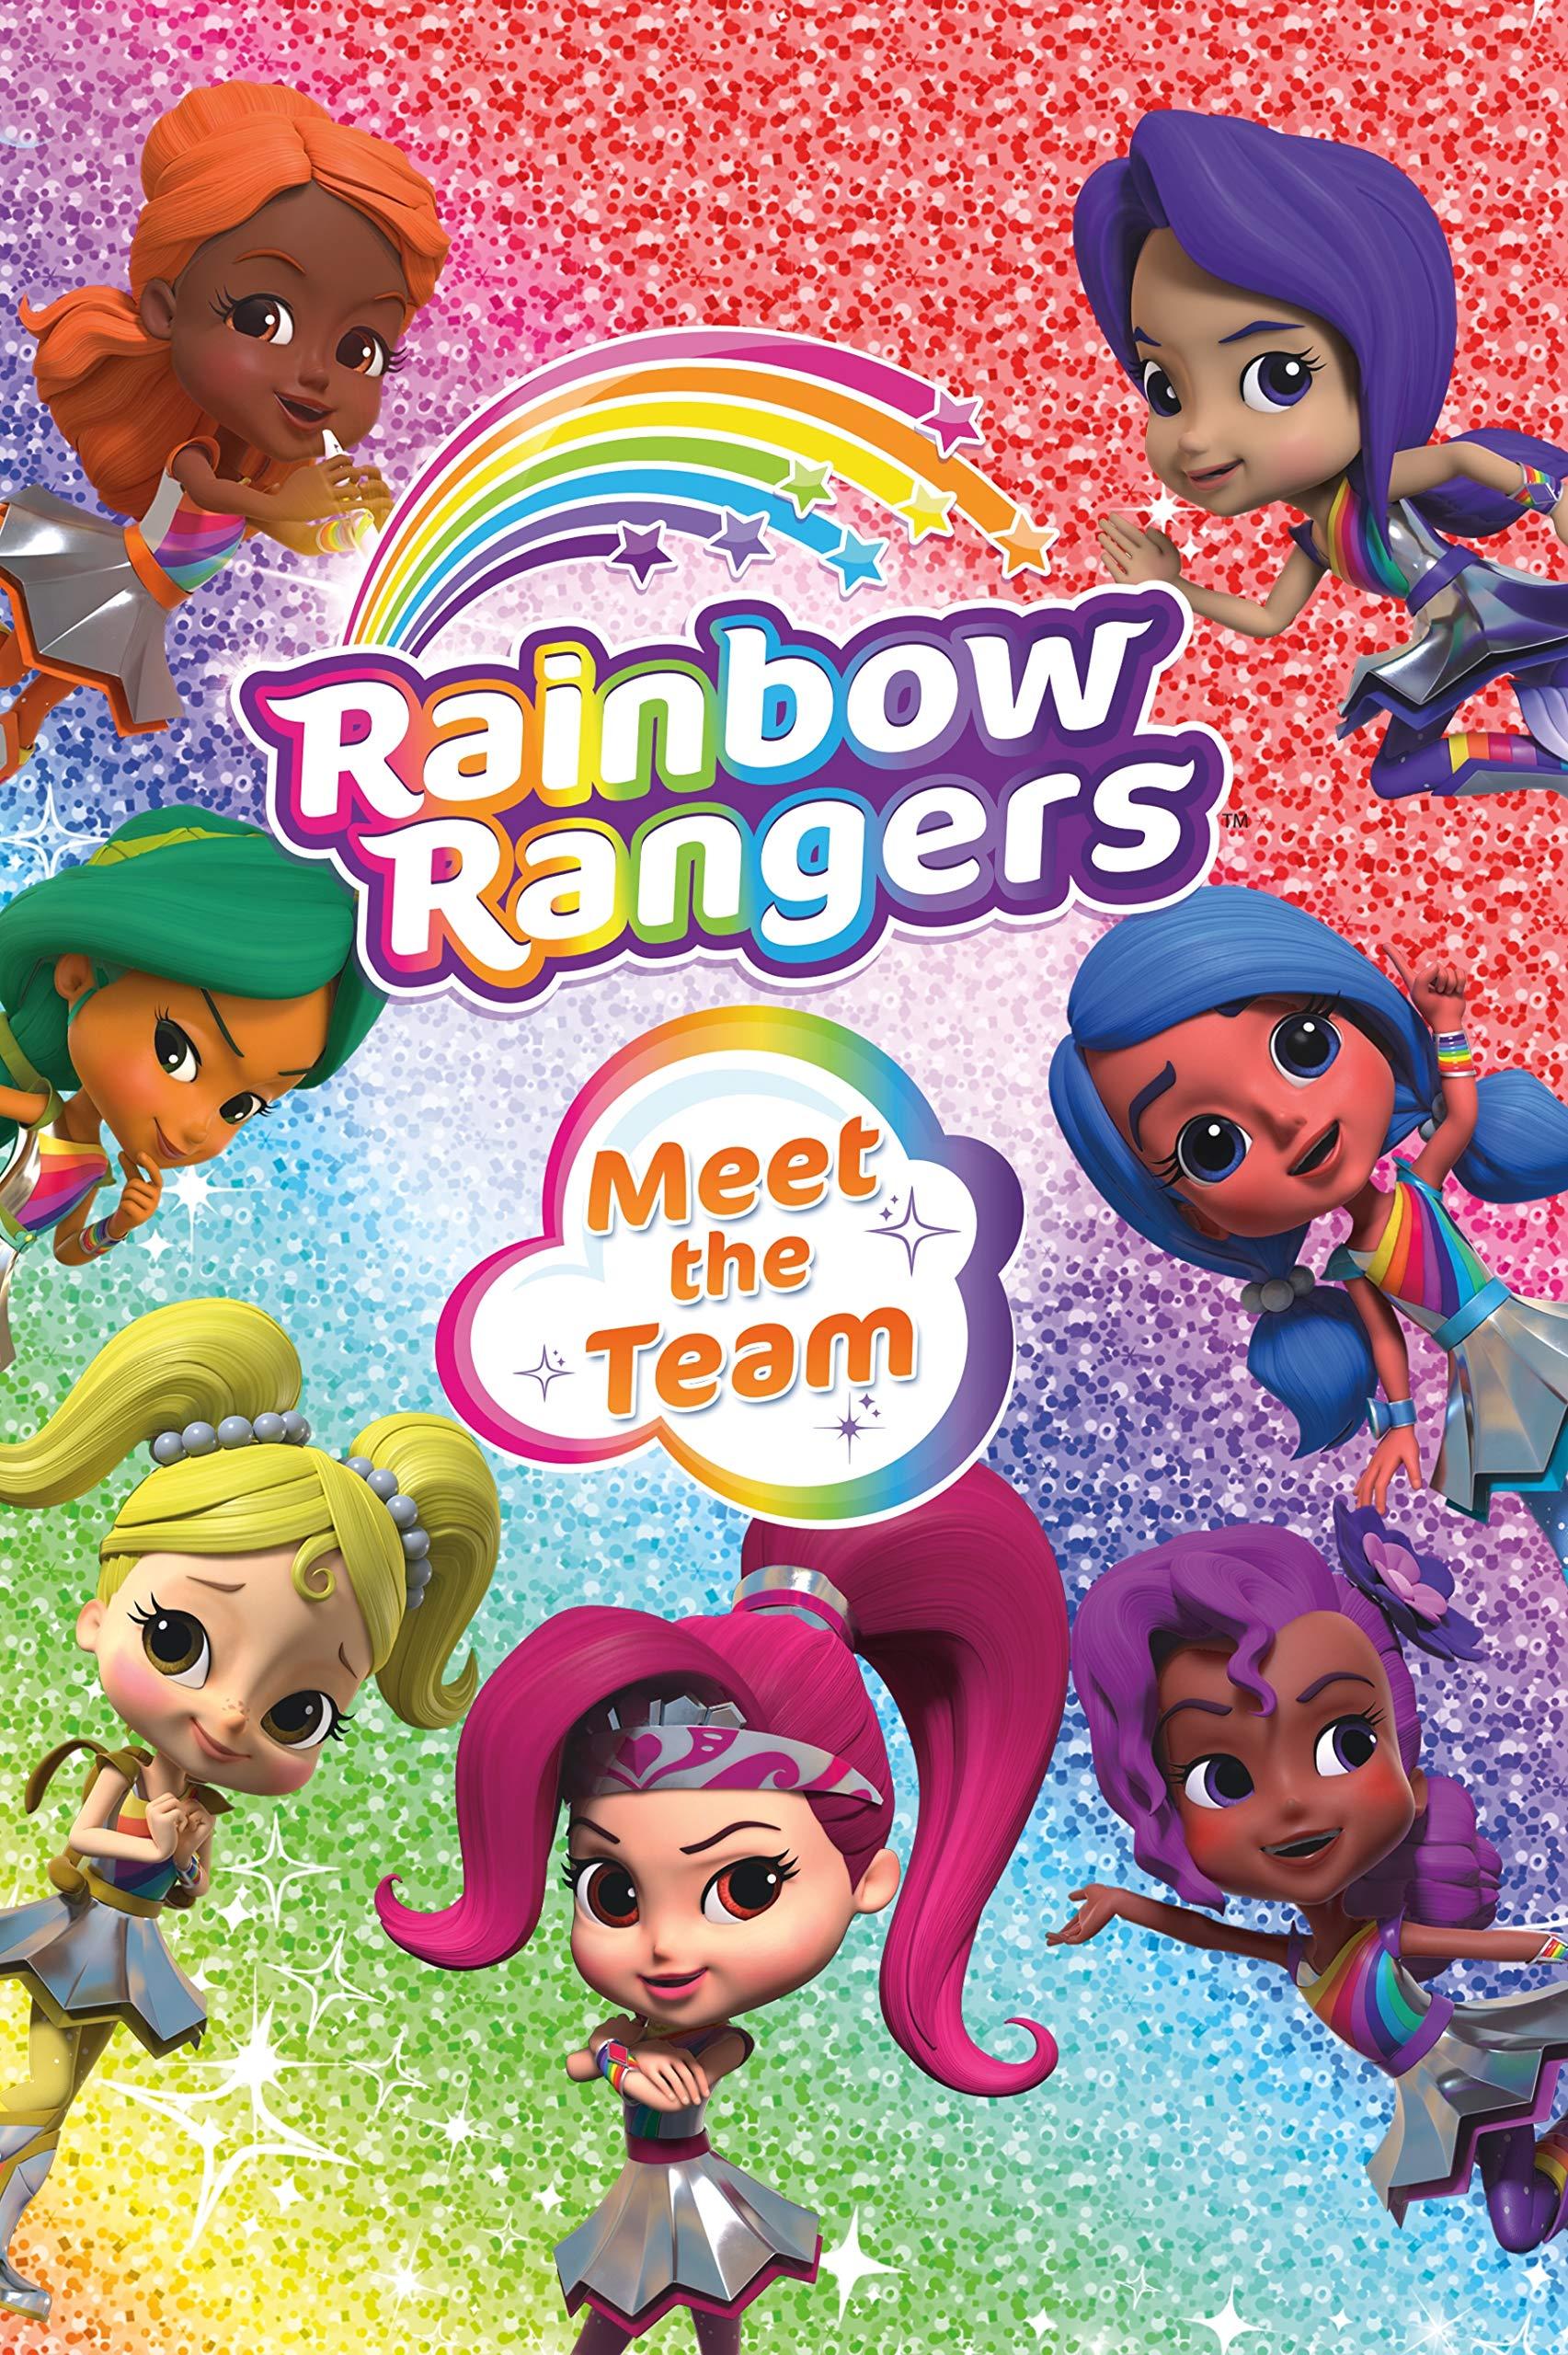 Rainbow Rangers Meet The Team Greene Summer 9781250190314 Books Amazon Ca